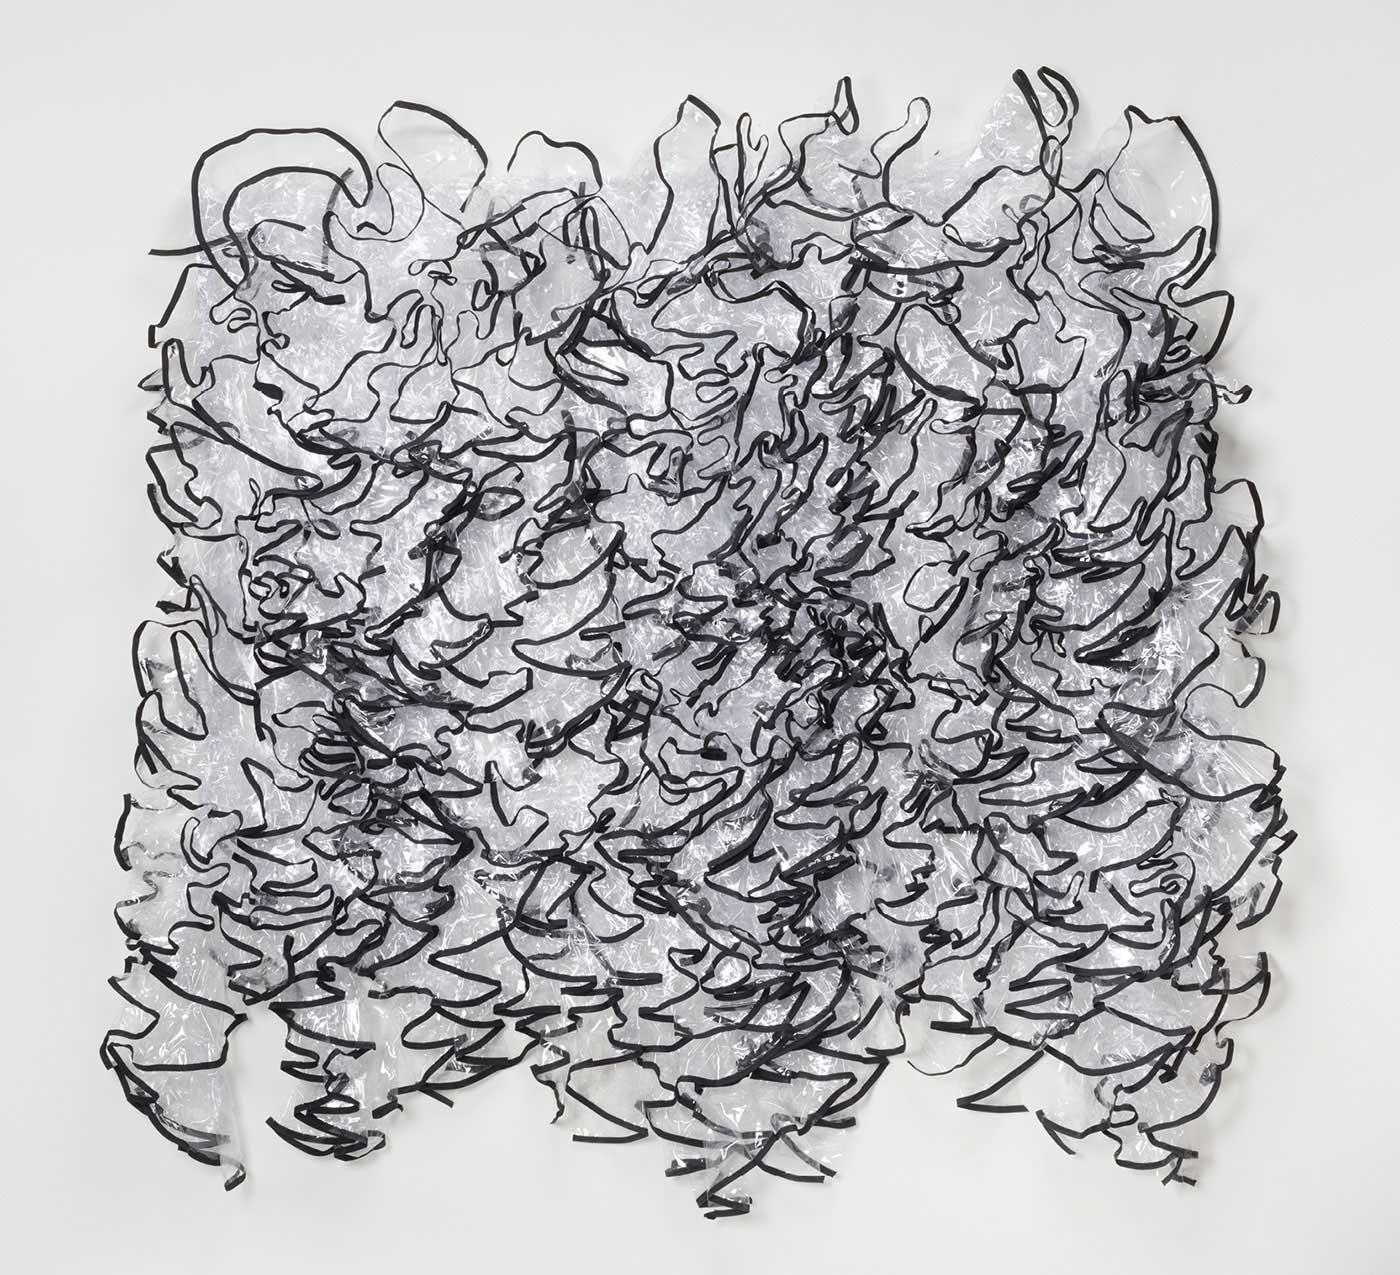 Vanessa Viruet - Edges/Black Line Study